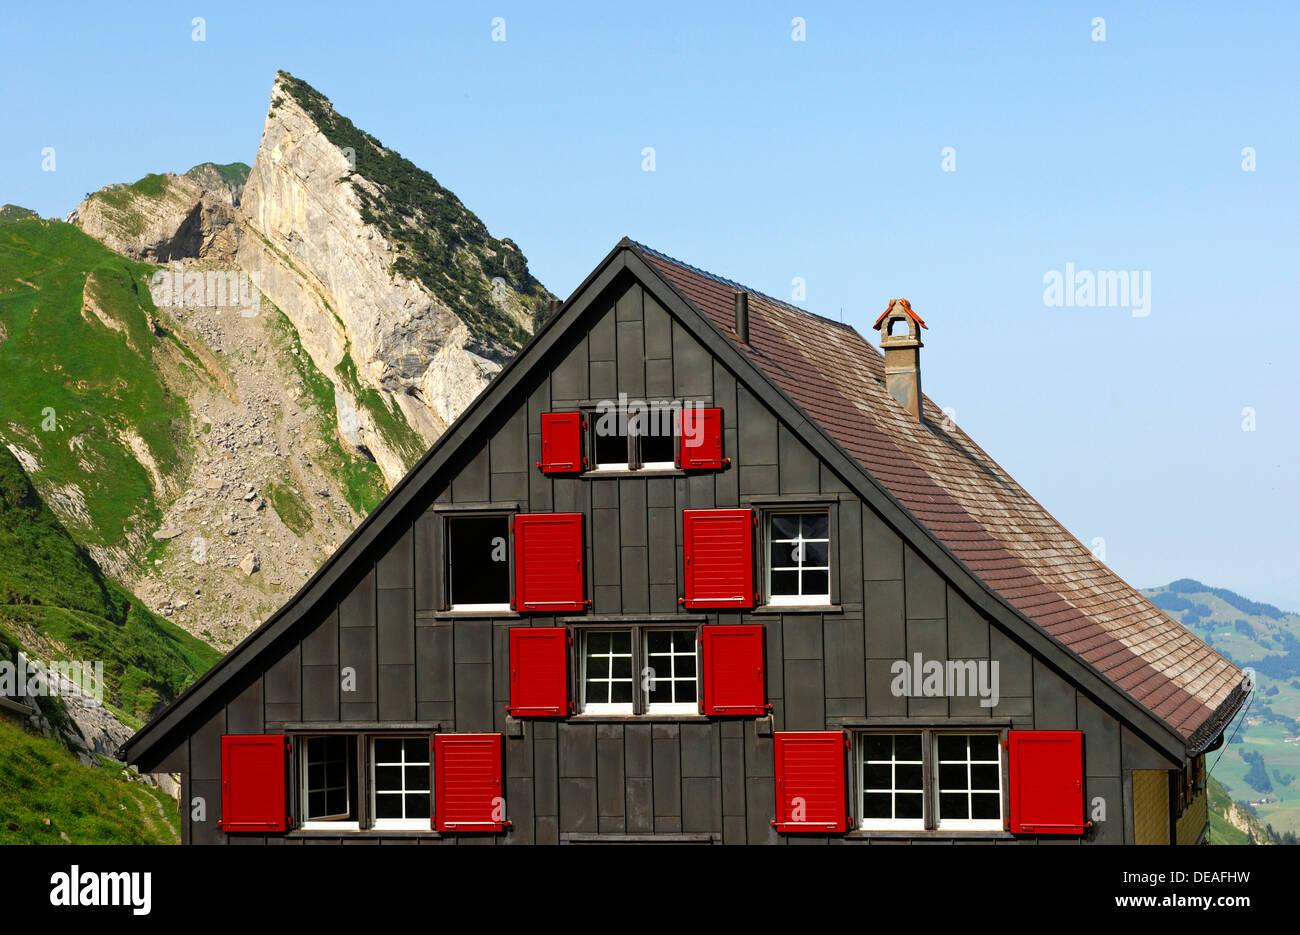 House on a mountain, rear side of the Mesmer Mountain Inn, Weissbad, Alpstein, Appenzell Innerrhoden, Switzerland, Europe - Stock Image